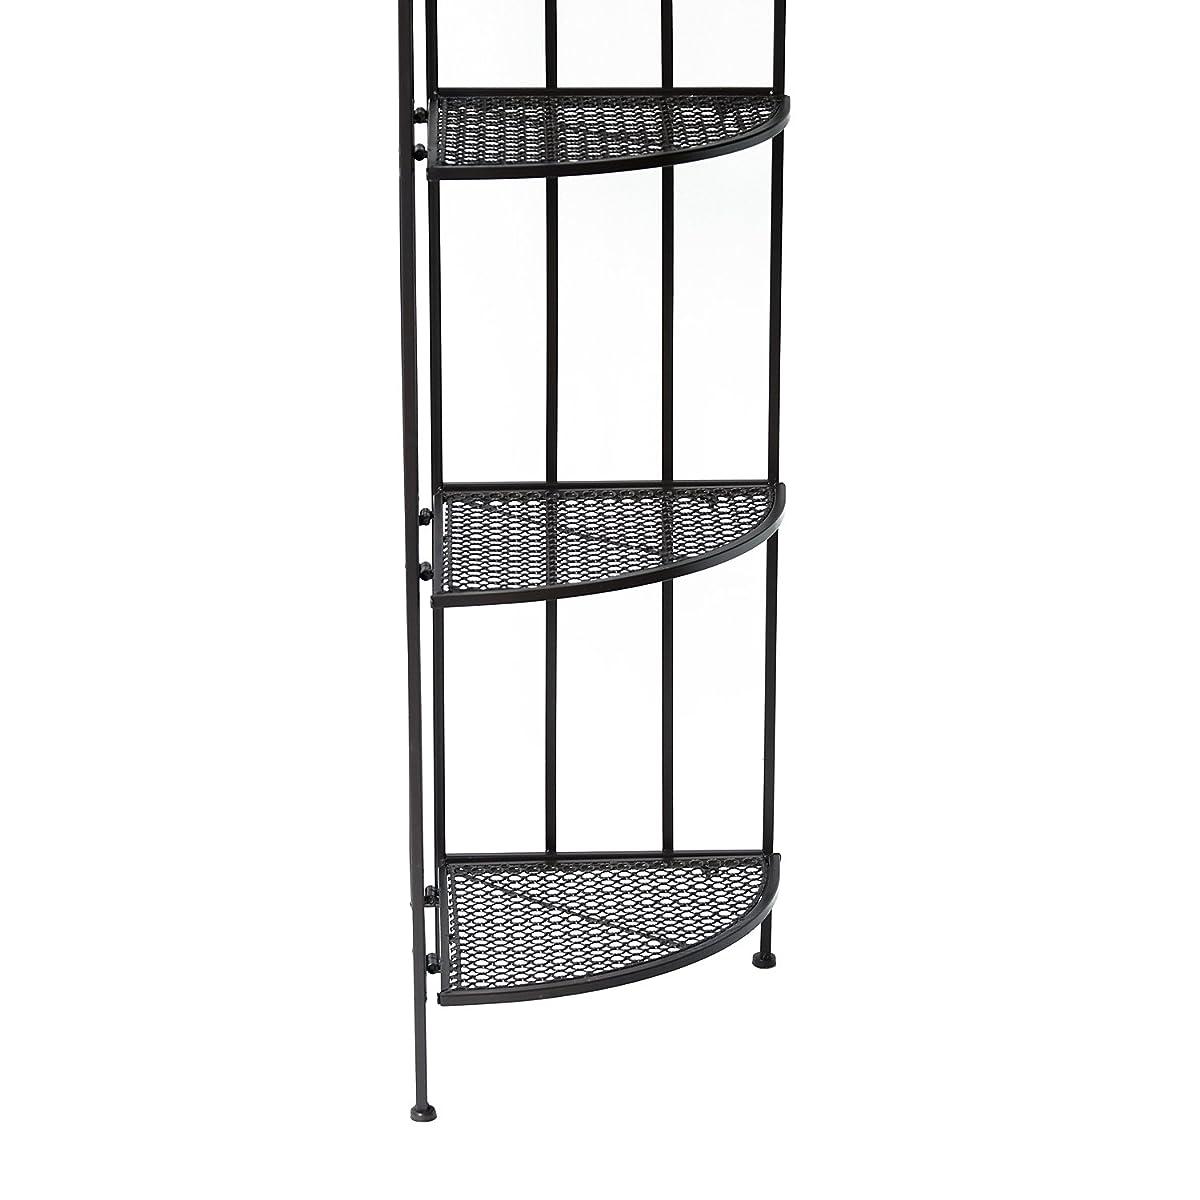 Outsunny 5 Tier Decorative Metal Corner Plant Shelf Stand